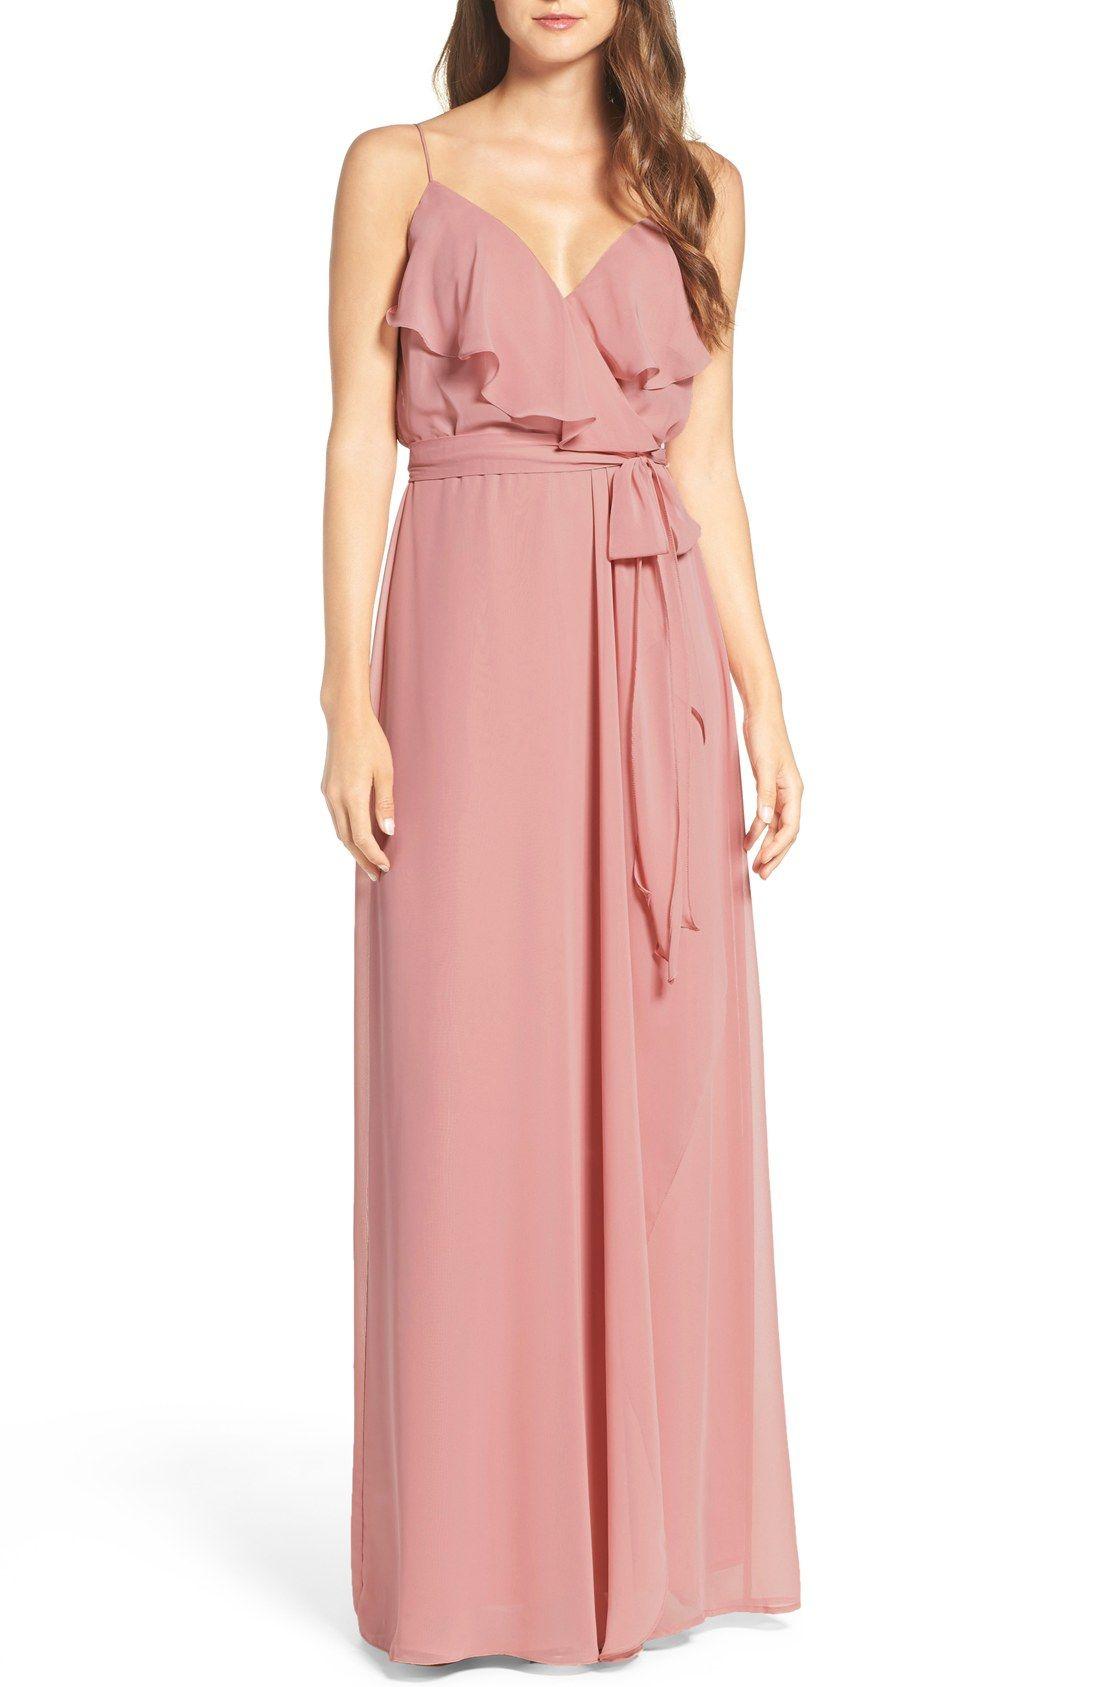 Drew\' Ruffle Front Chiffon Gown | Blush Weddings | Pinterest